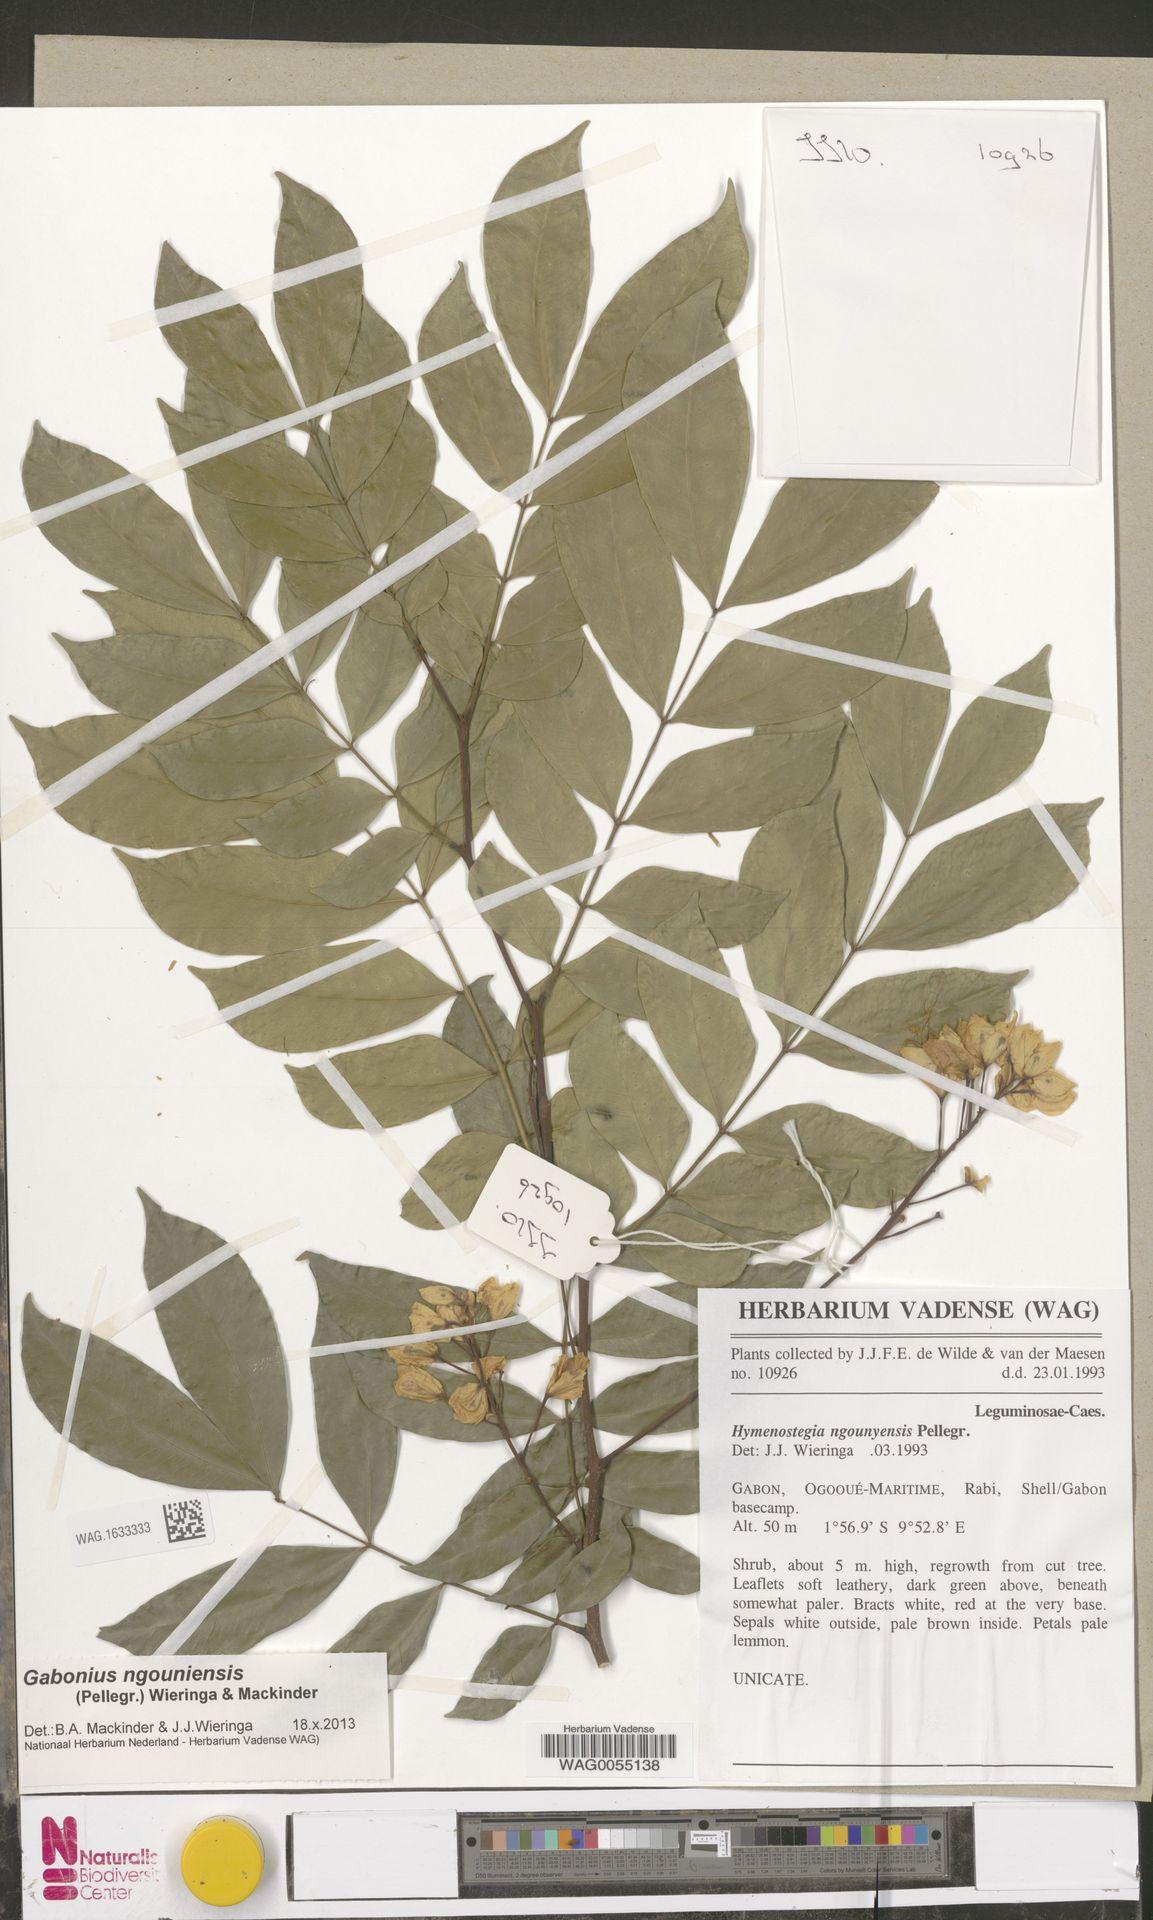 WAG.1633333 | Gabonius ngouniensis (Pellegr.) Wieringa & Mackinder